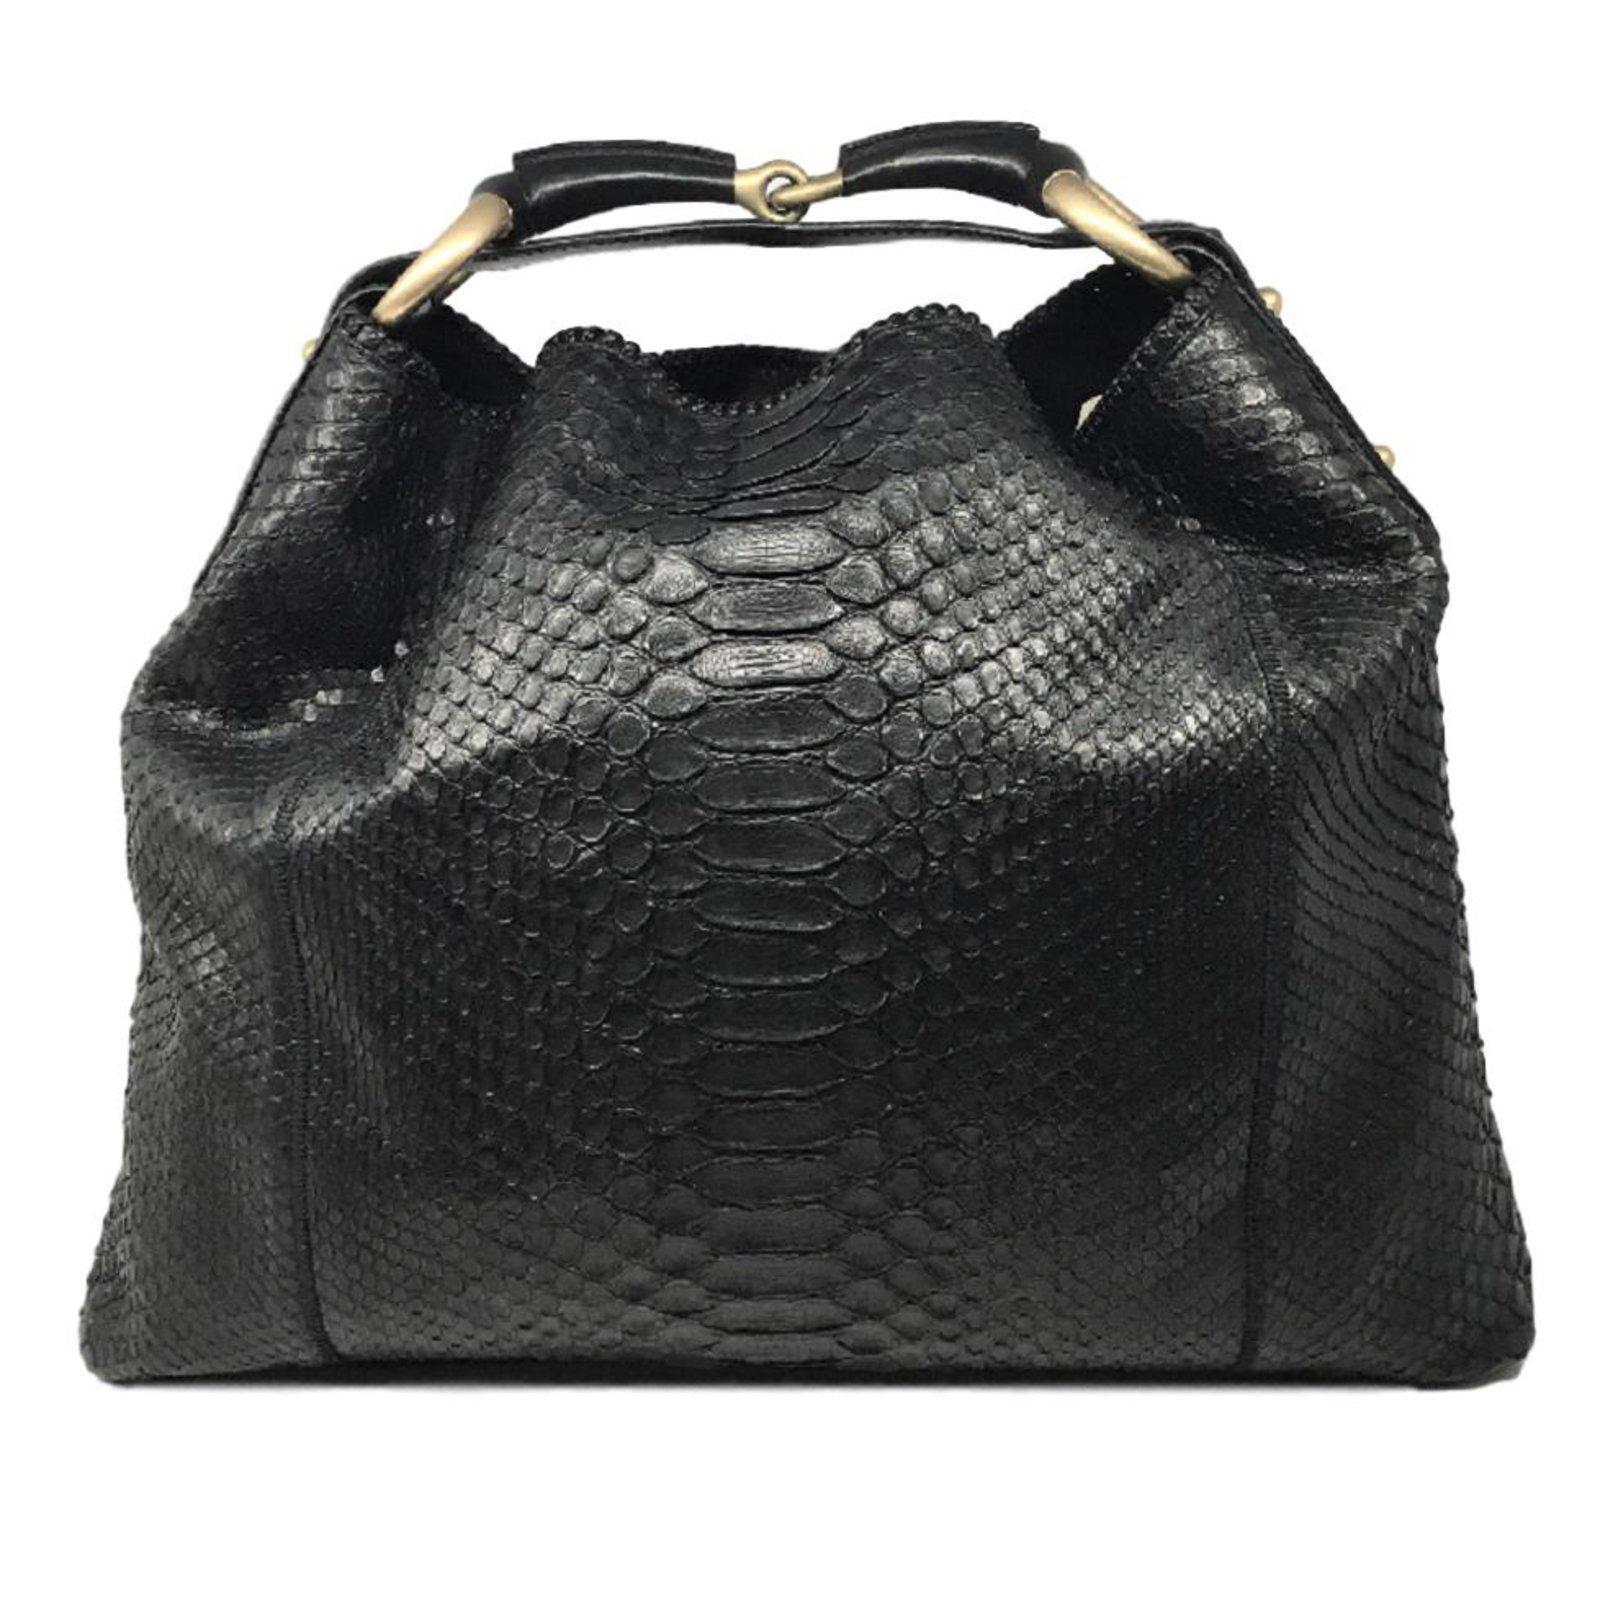 a21c796b5219d9 Gucci Horsebit Python Hobo bag Handbags Exotic leather Black ref.86553